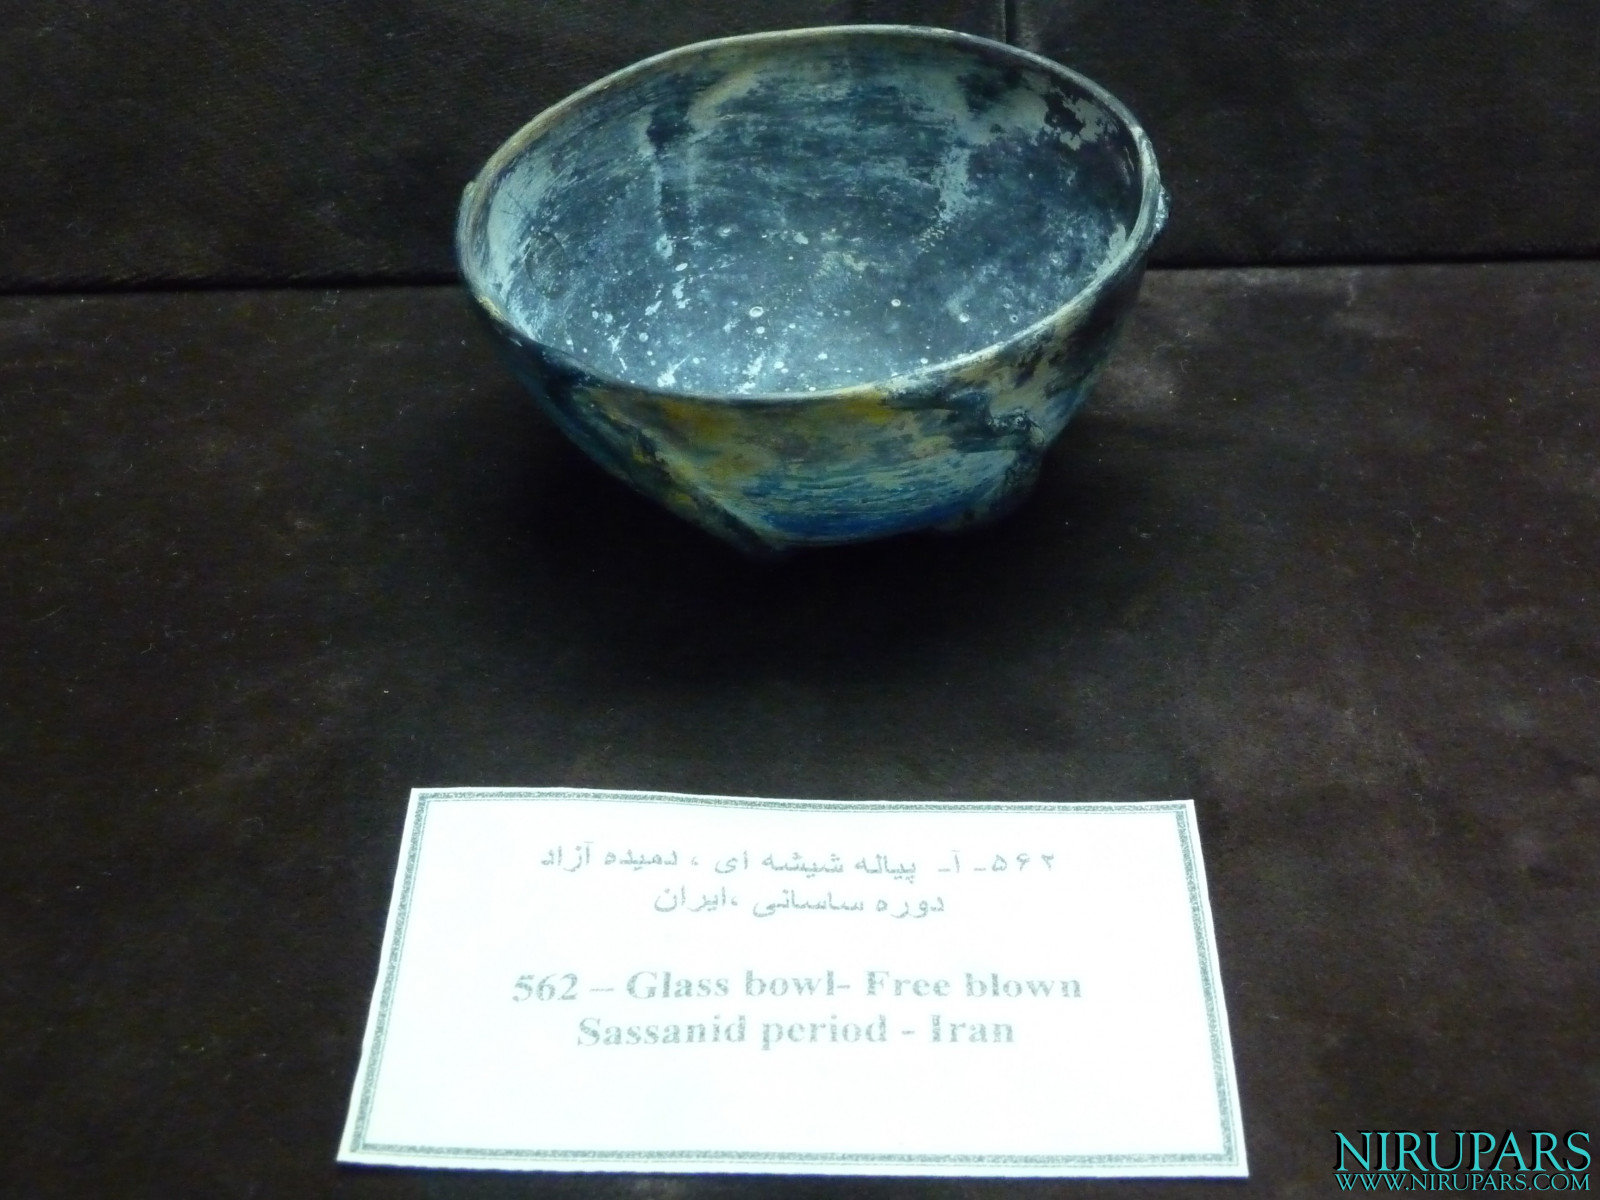 Glassware and Ceramic Museum - Bowl Glass